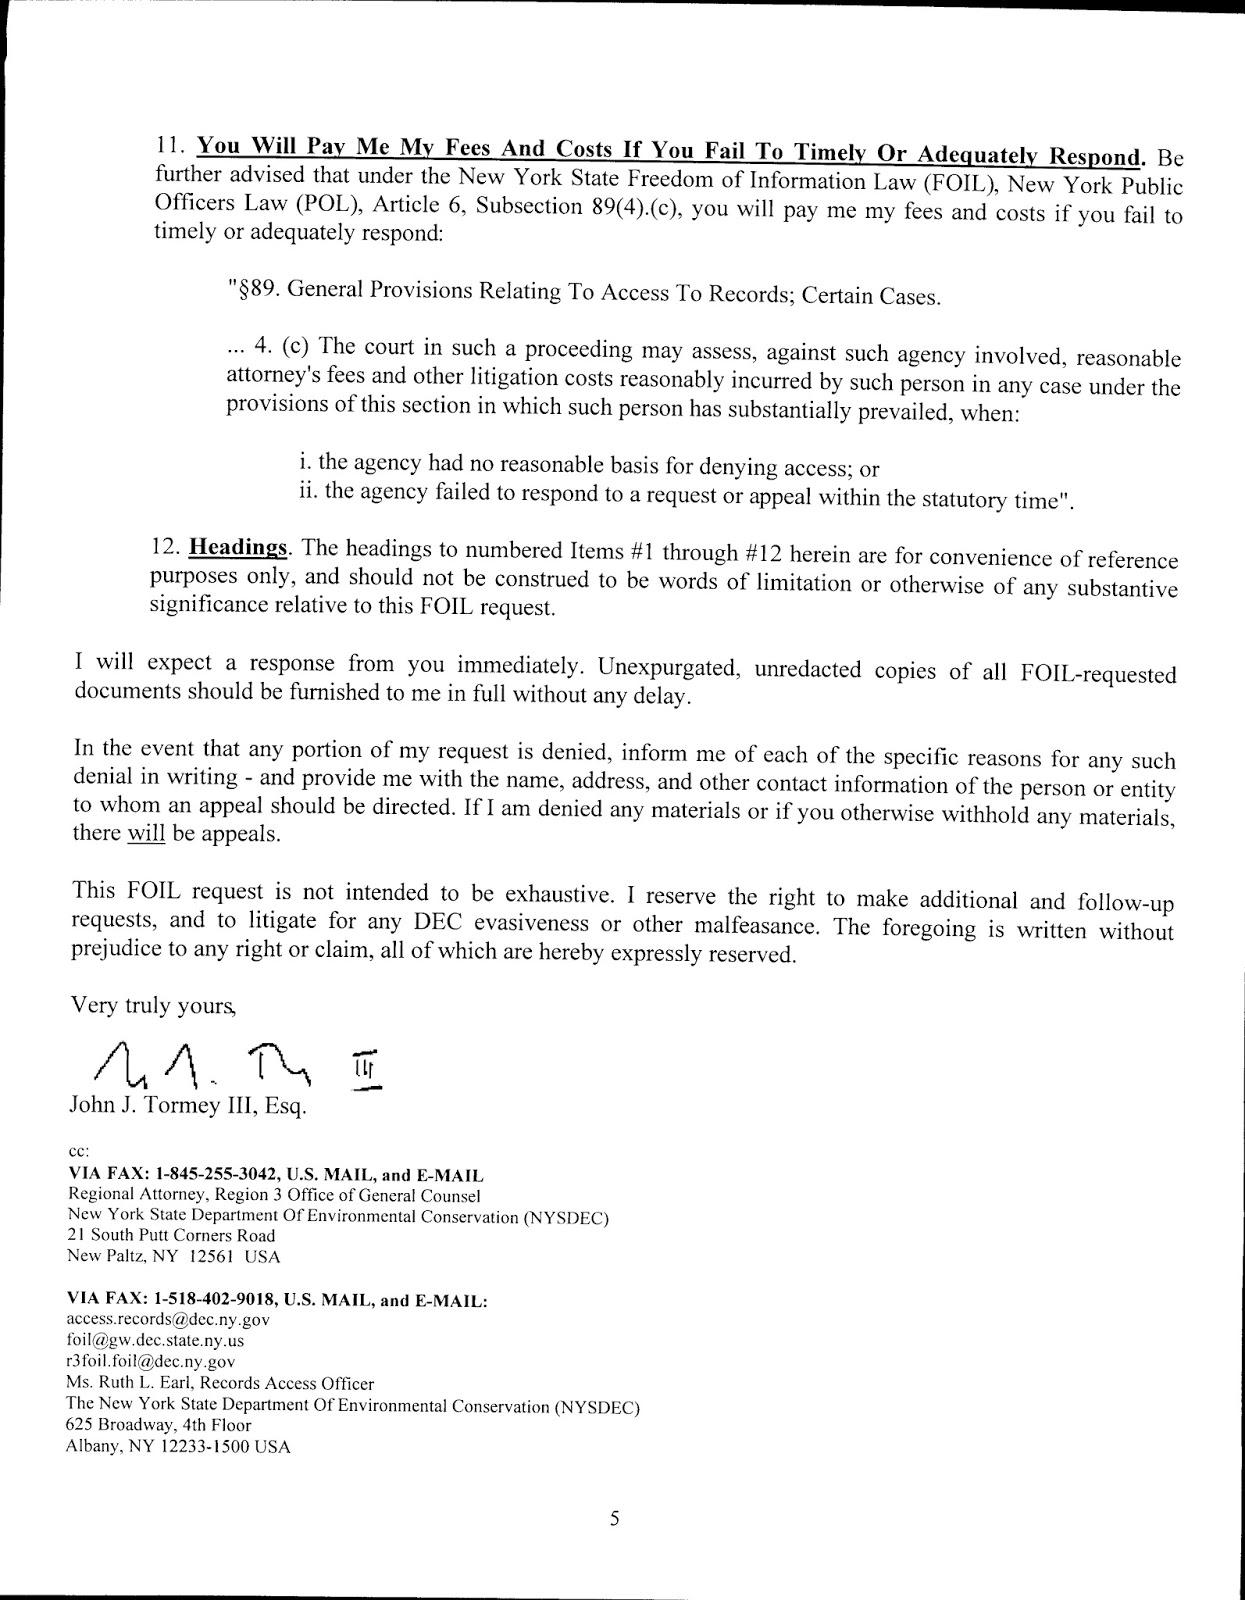 Http anellotech blogspot com 2015 05 foil demand to nysdec environmental_31 html